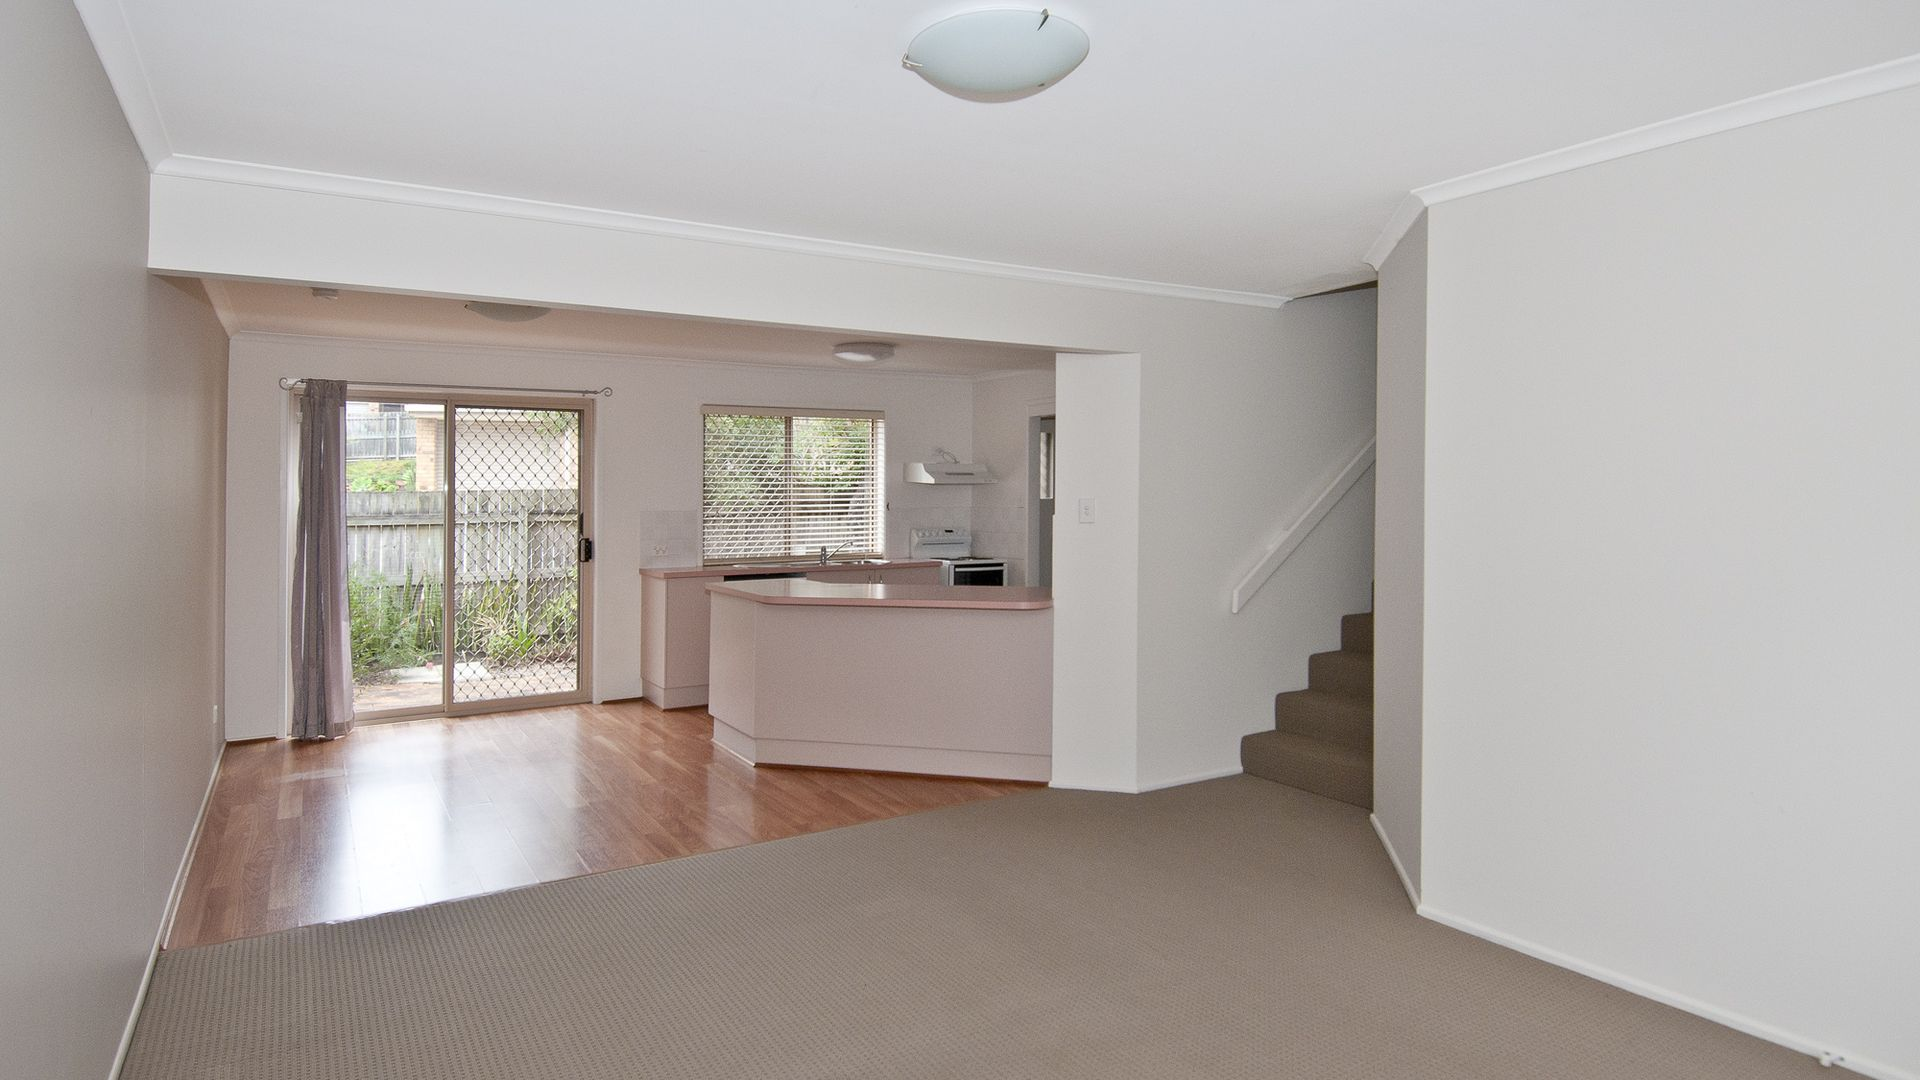 3/406 Chatswood Rd, Shailer Park QLD 4128, Image 1